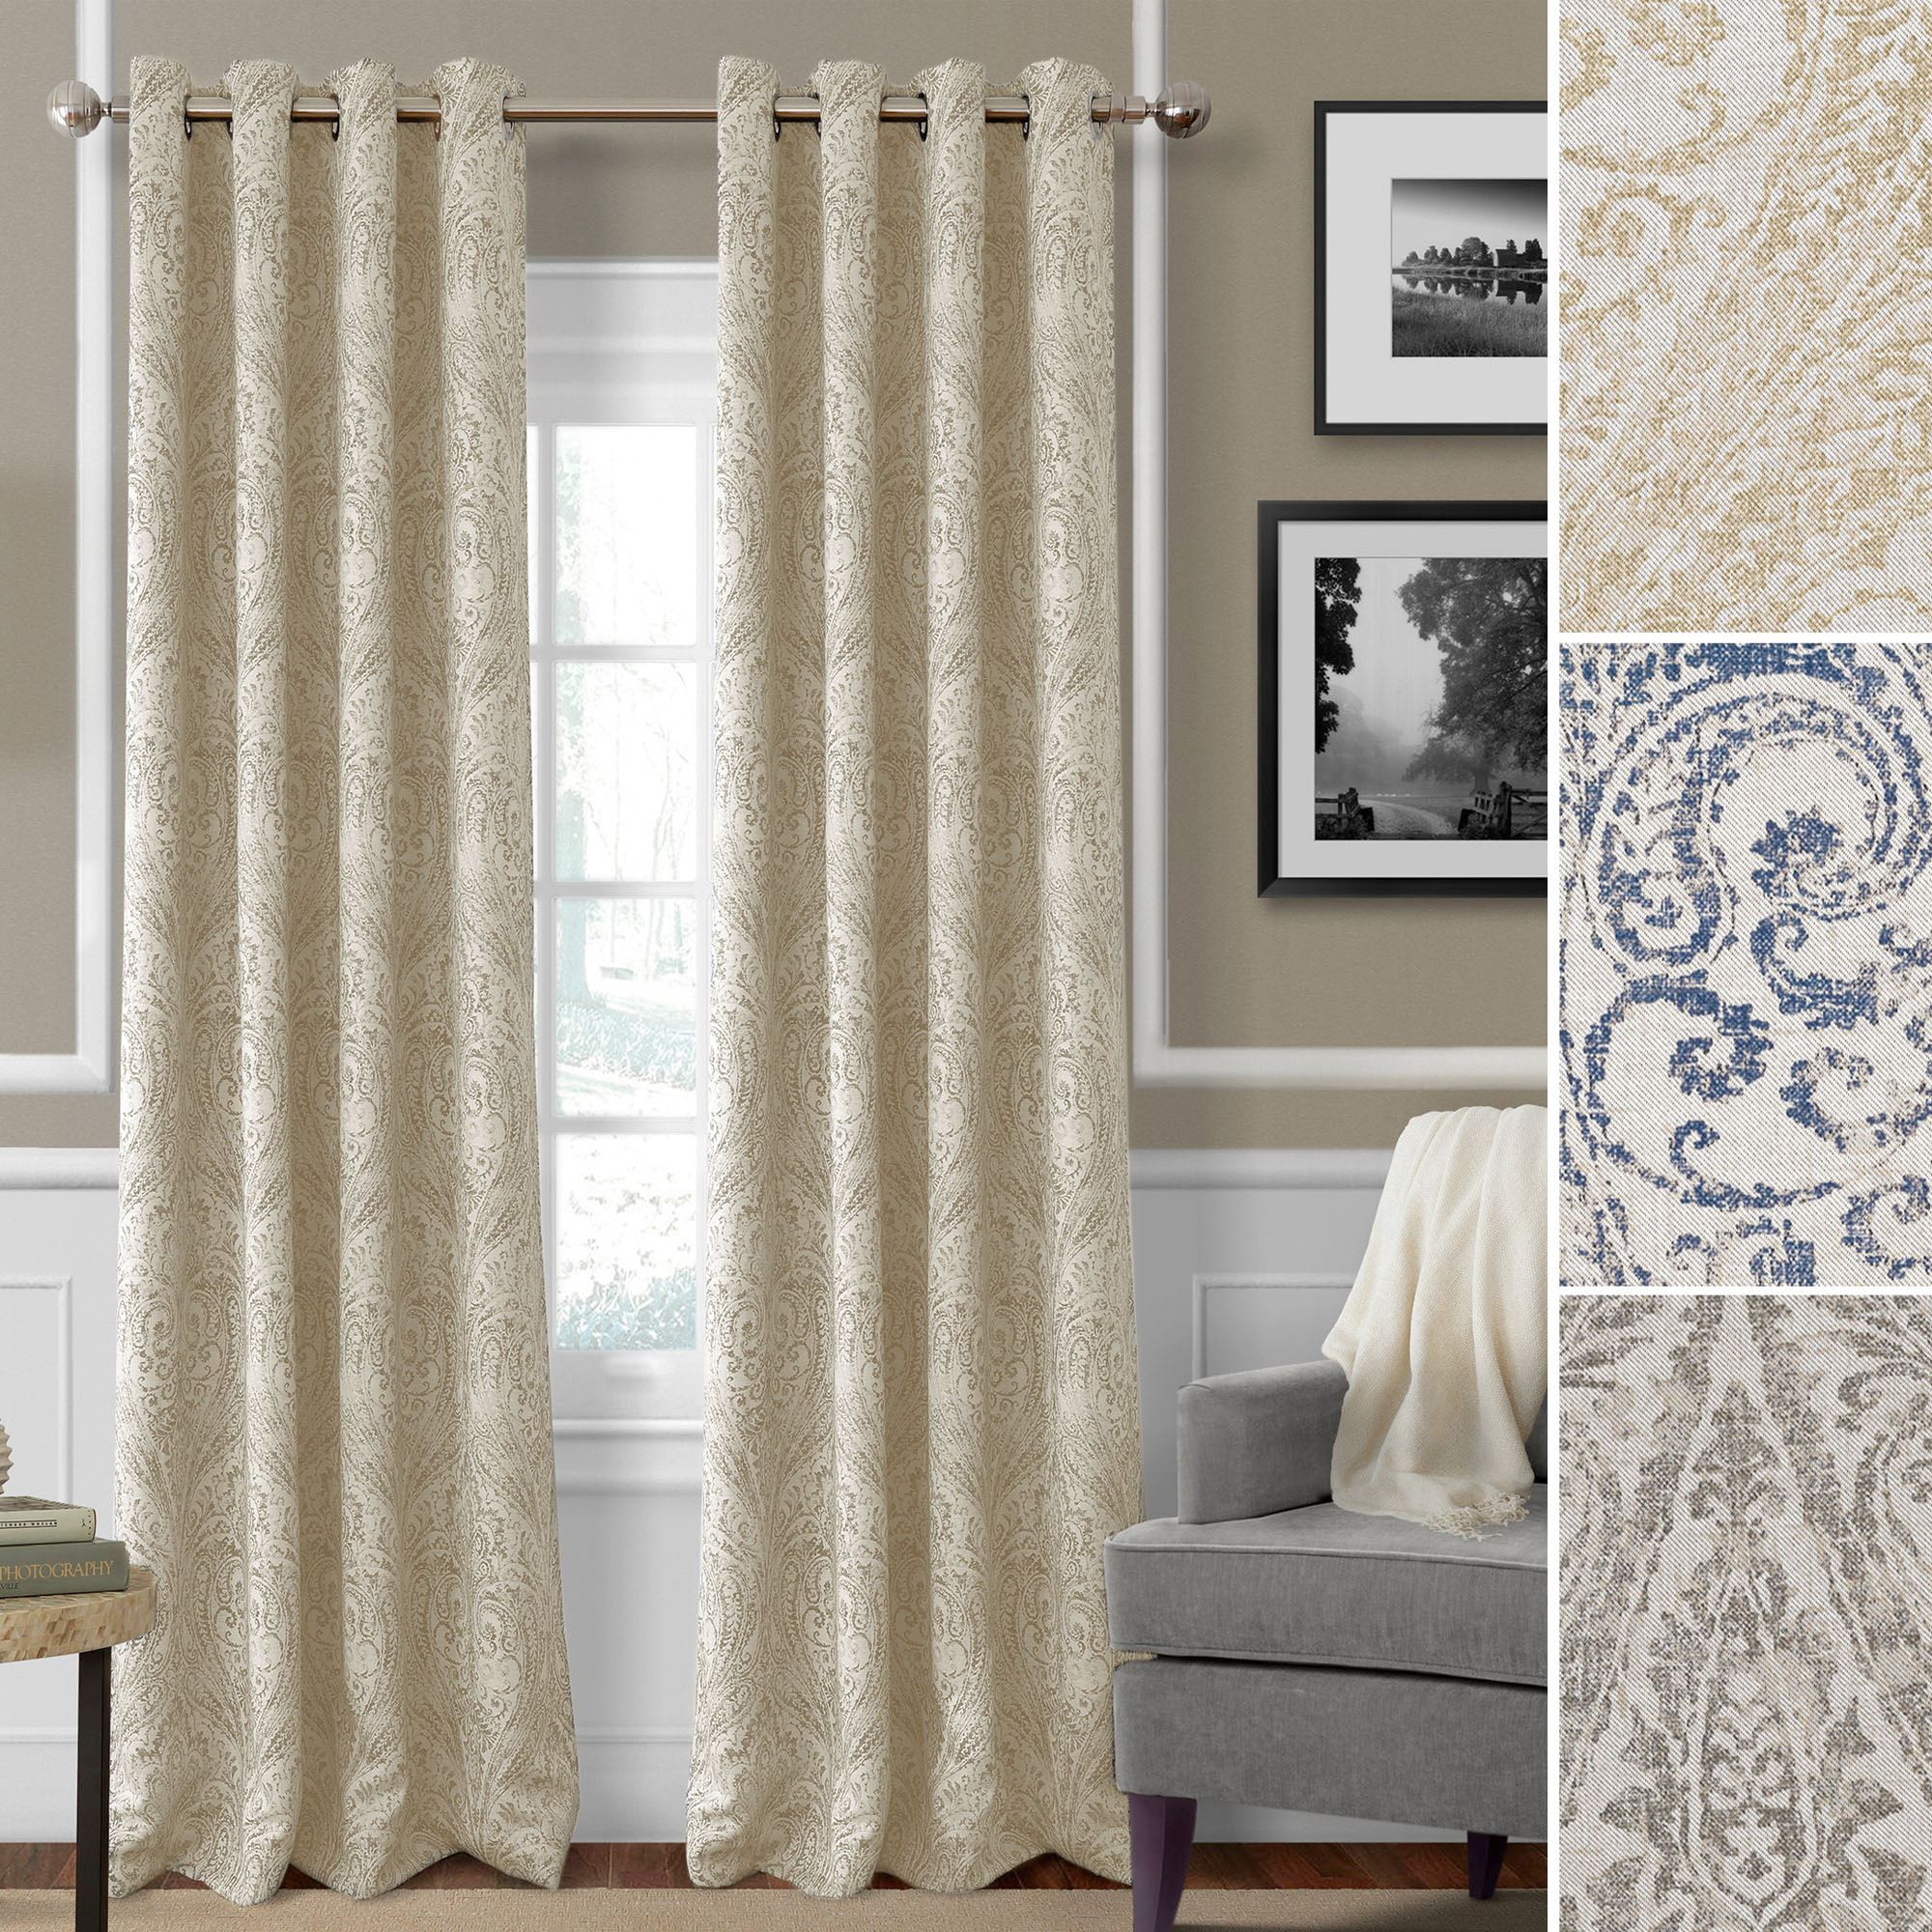 Julianne Room Darkening Grommet Curtain Panels throughout Grommet Room Darkening Curtain Panels (Image 9 of 20)